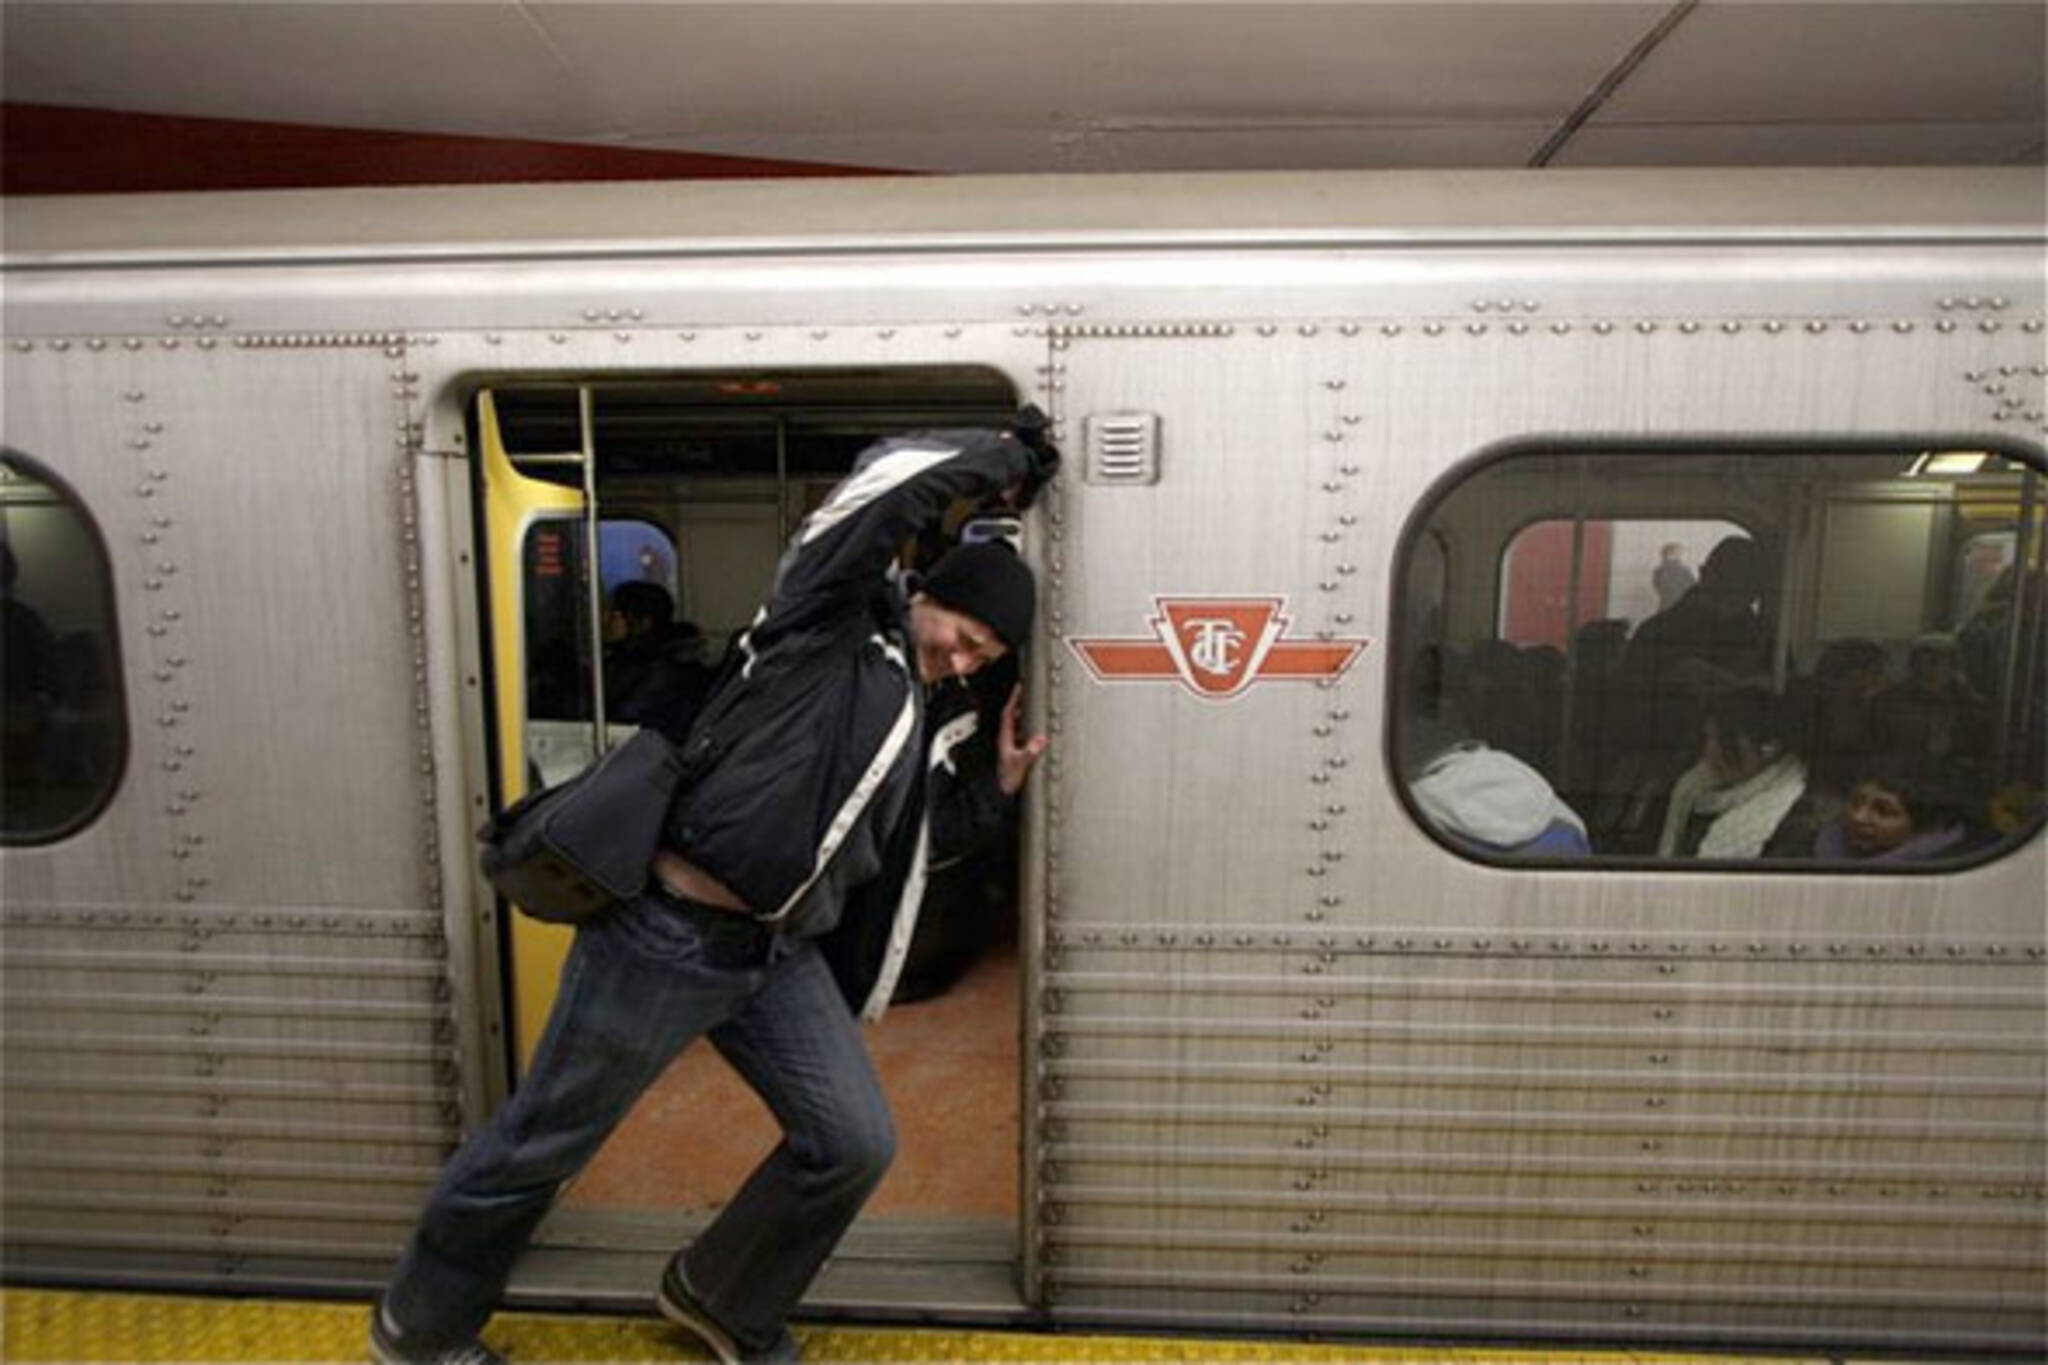 ttc subway toronto